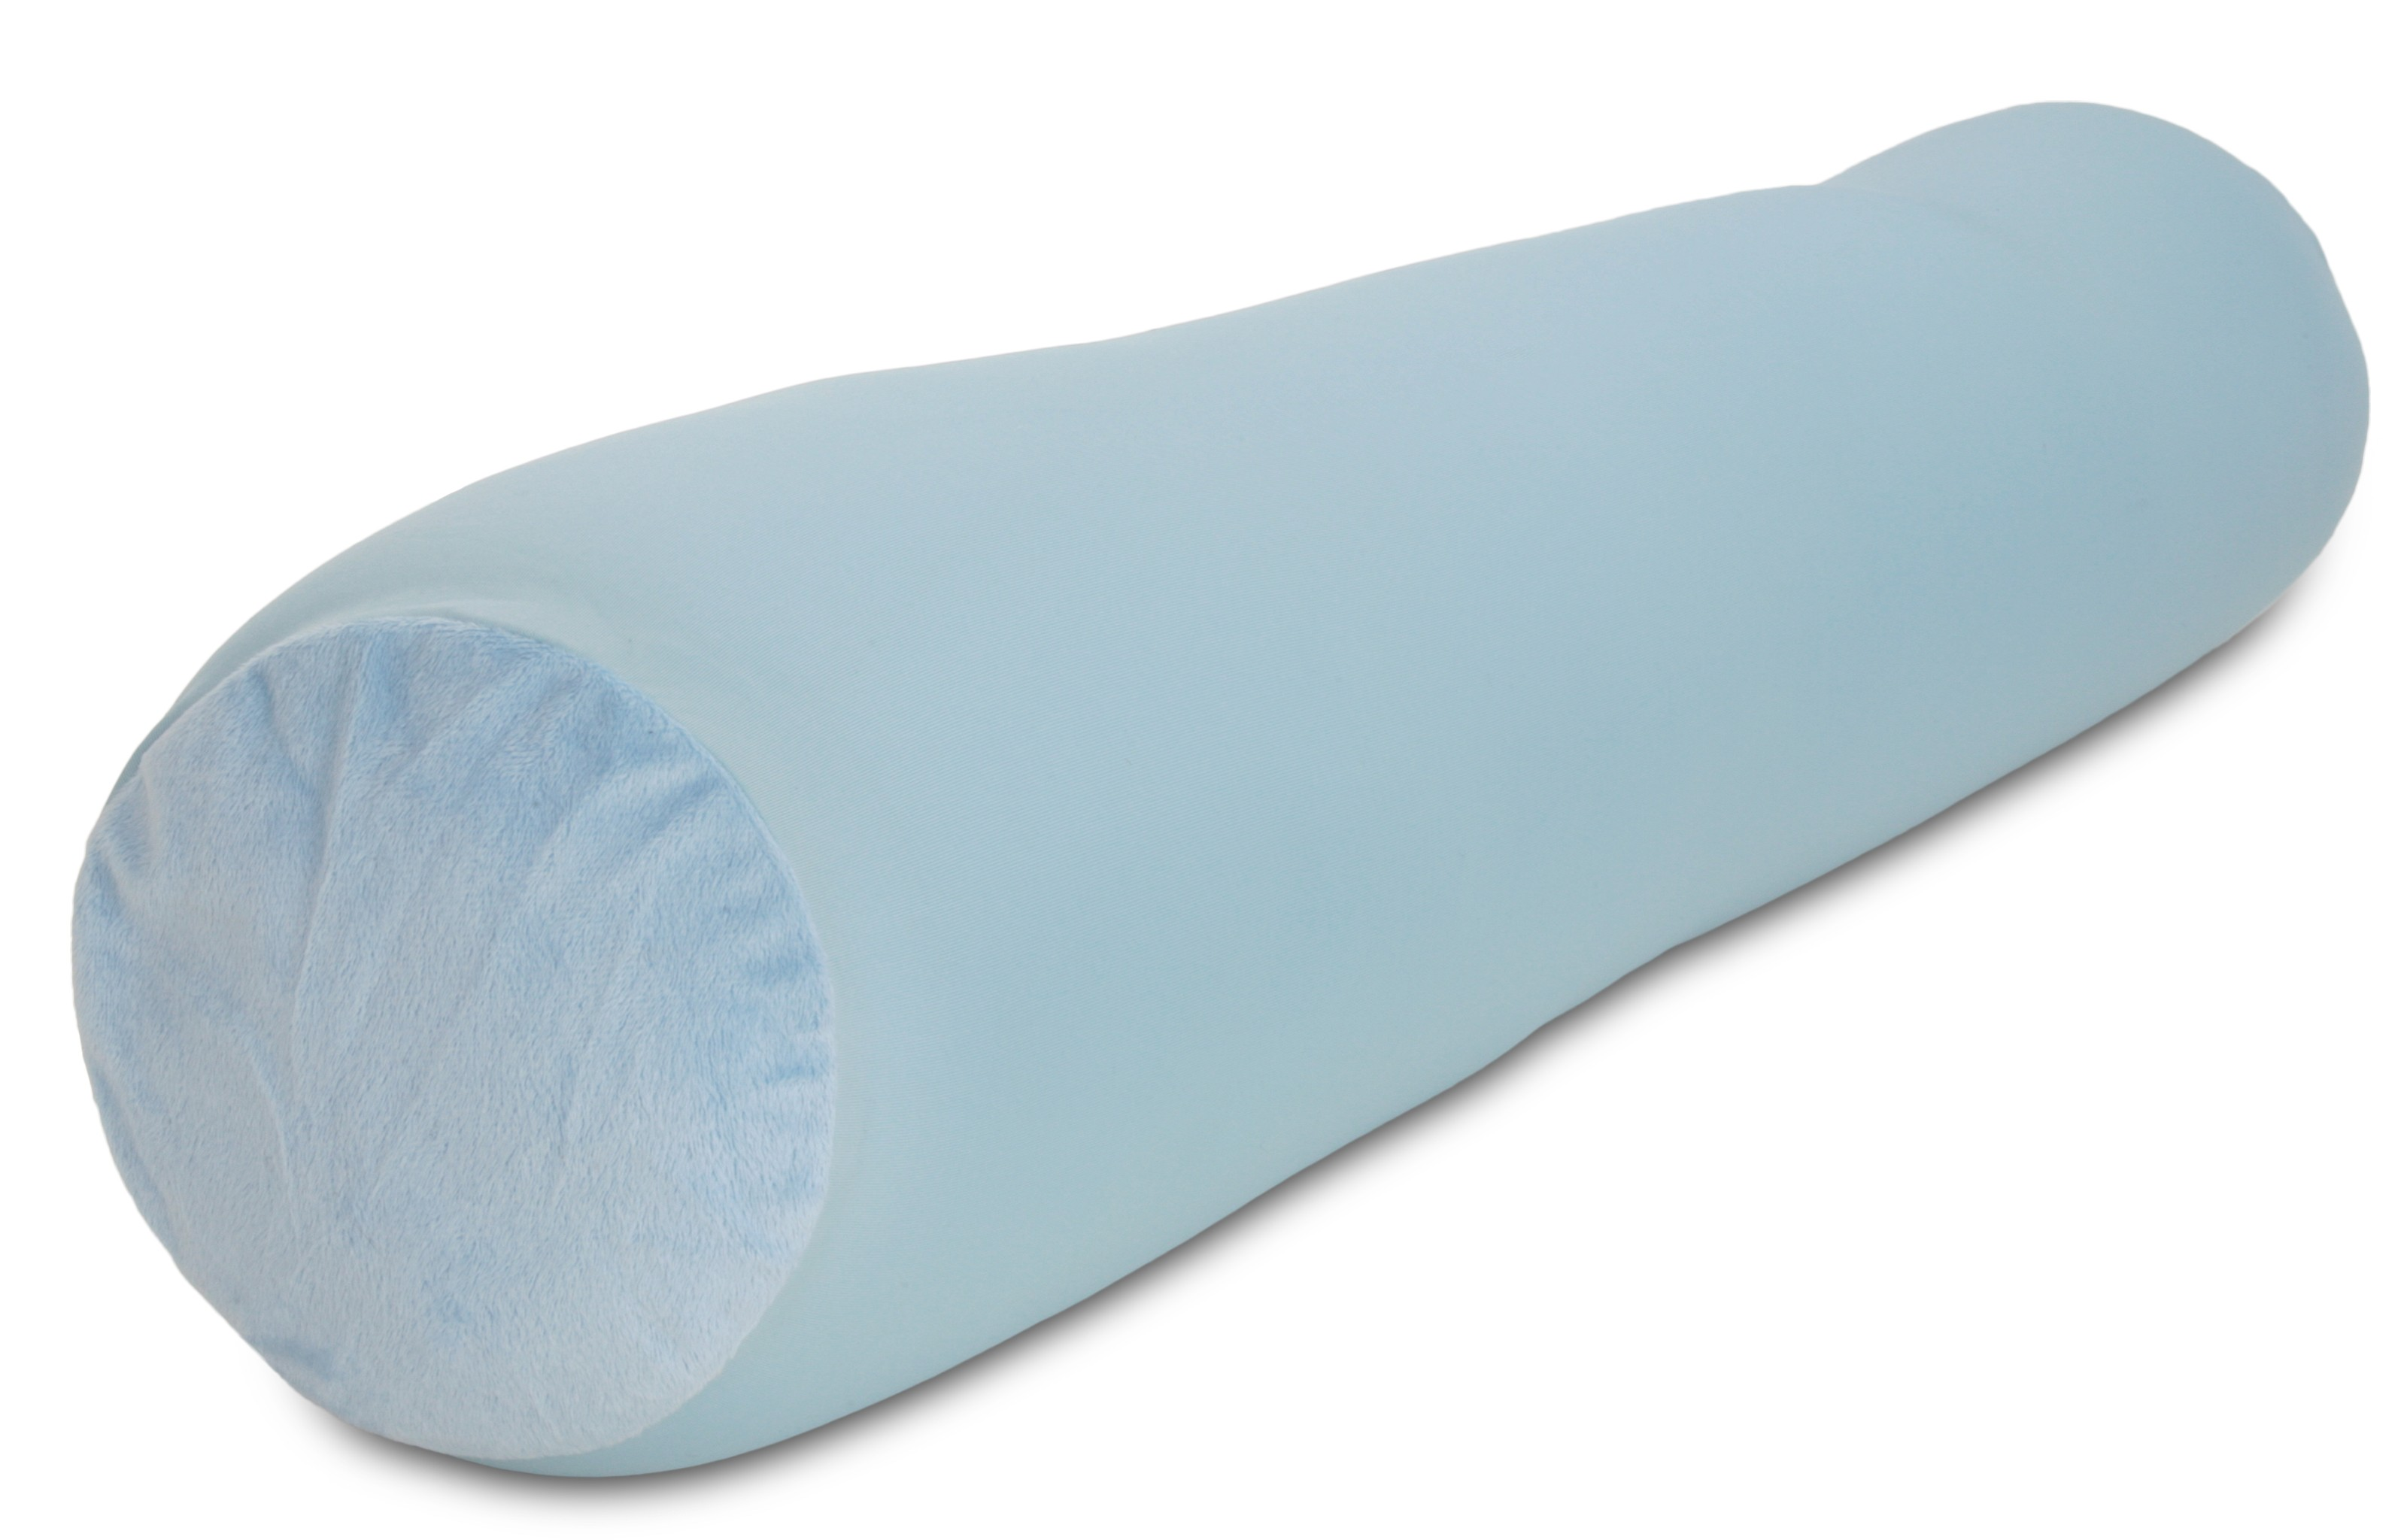 deluxe comfort microbead body pillow 47 x 7 mooshi squishy soft prenatal pregnancy pillow full body side sleeper body pillow light blue